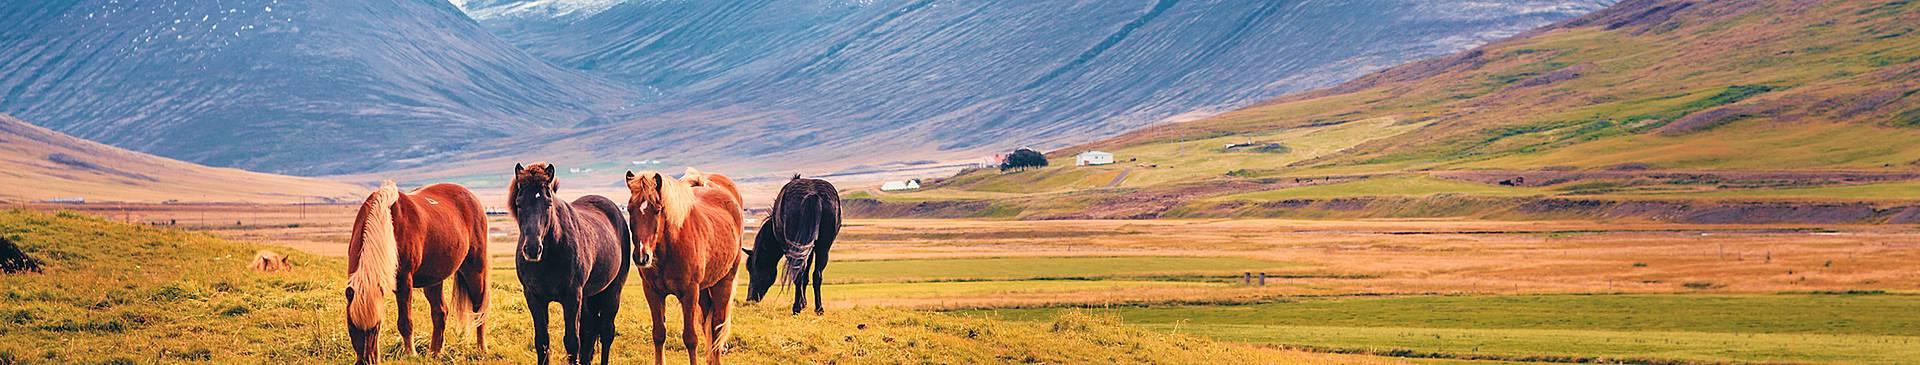 Viajes a Islandia en primavera